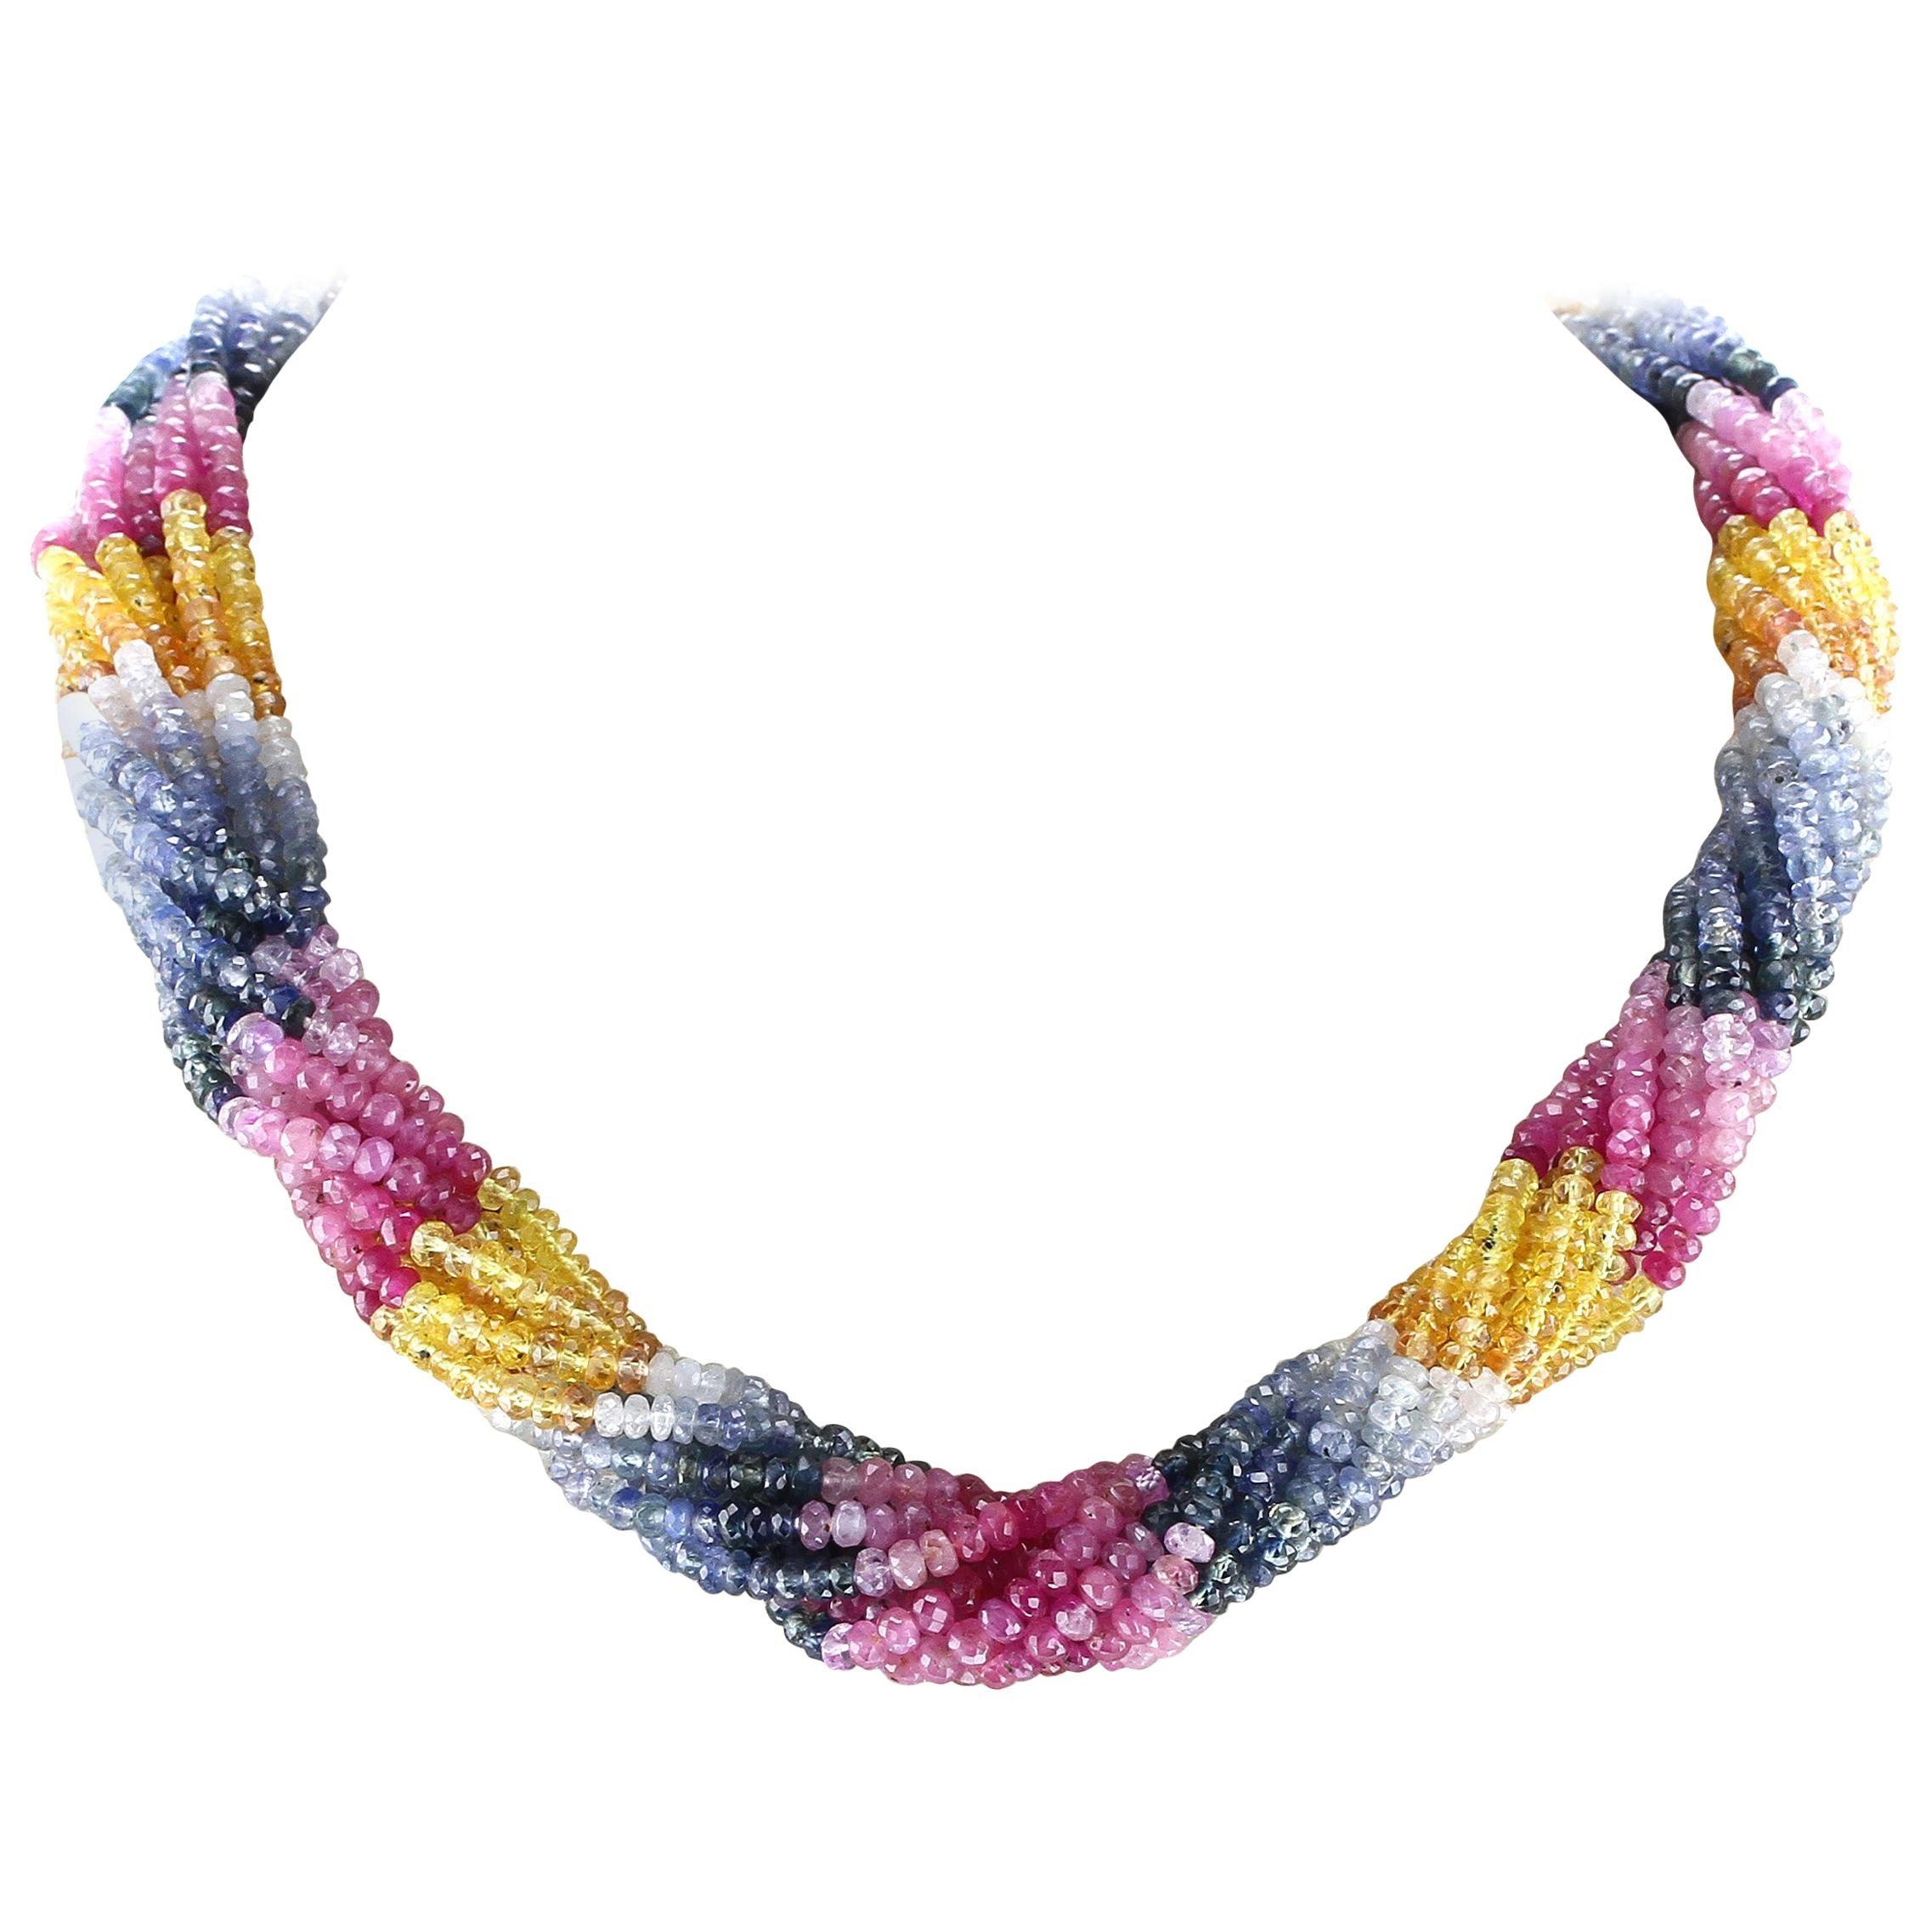 Natural Multi-Sapphire Choker Necklace, 18 Karat Yellow Gold Clasp